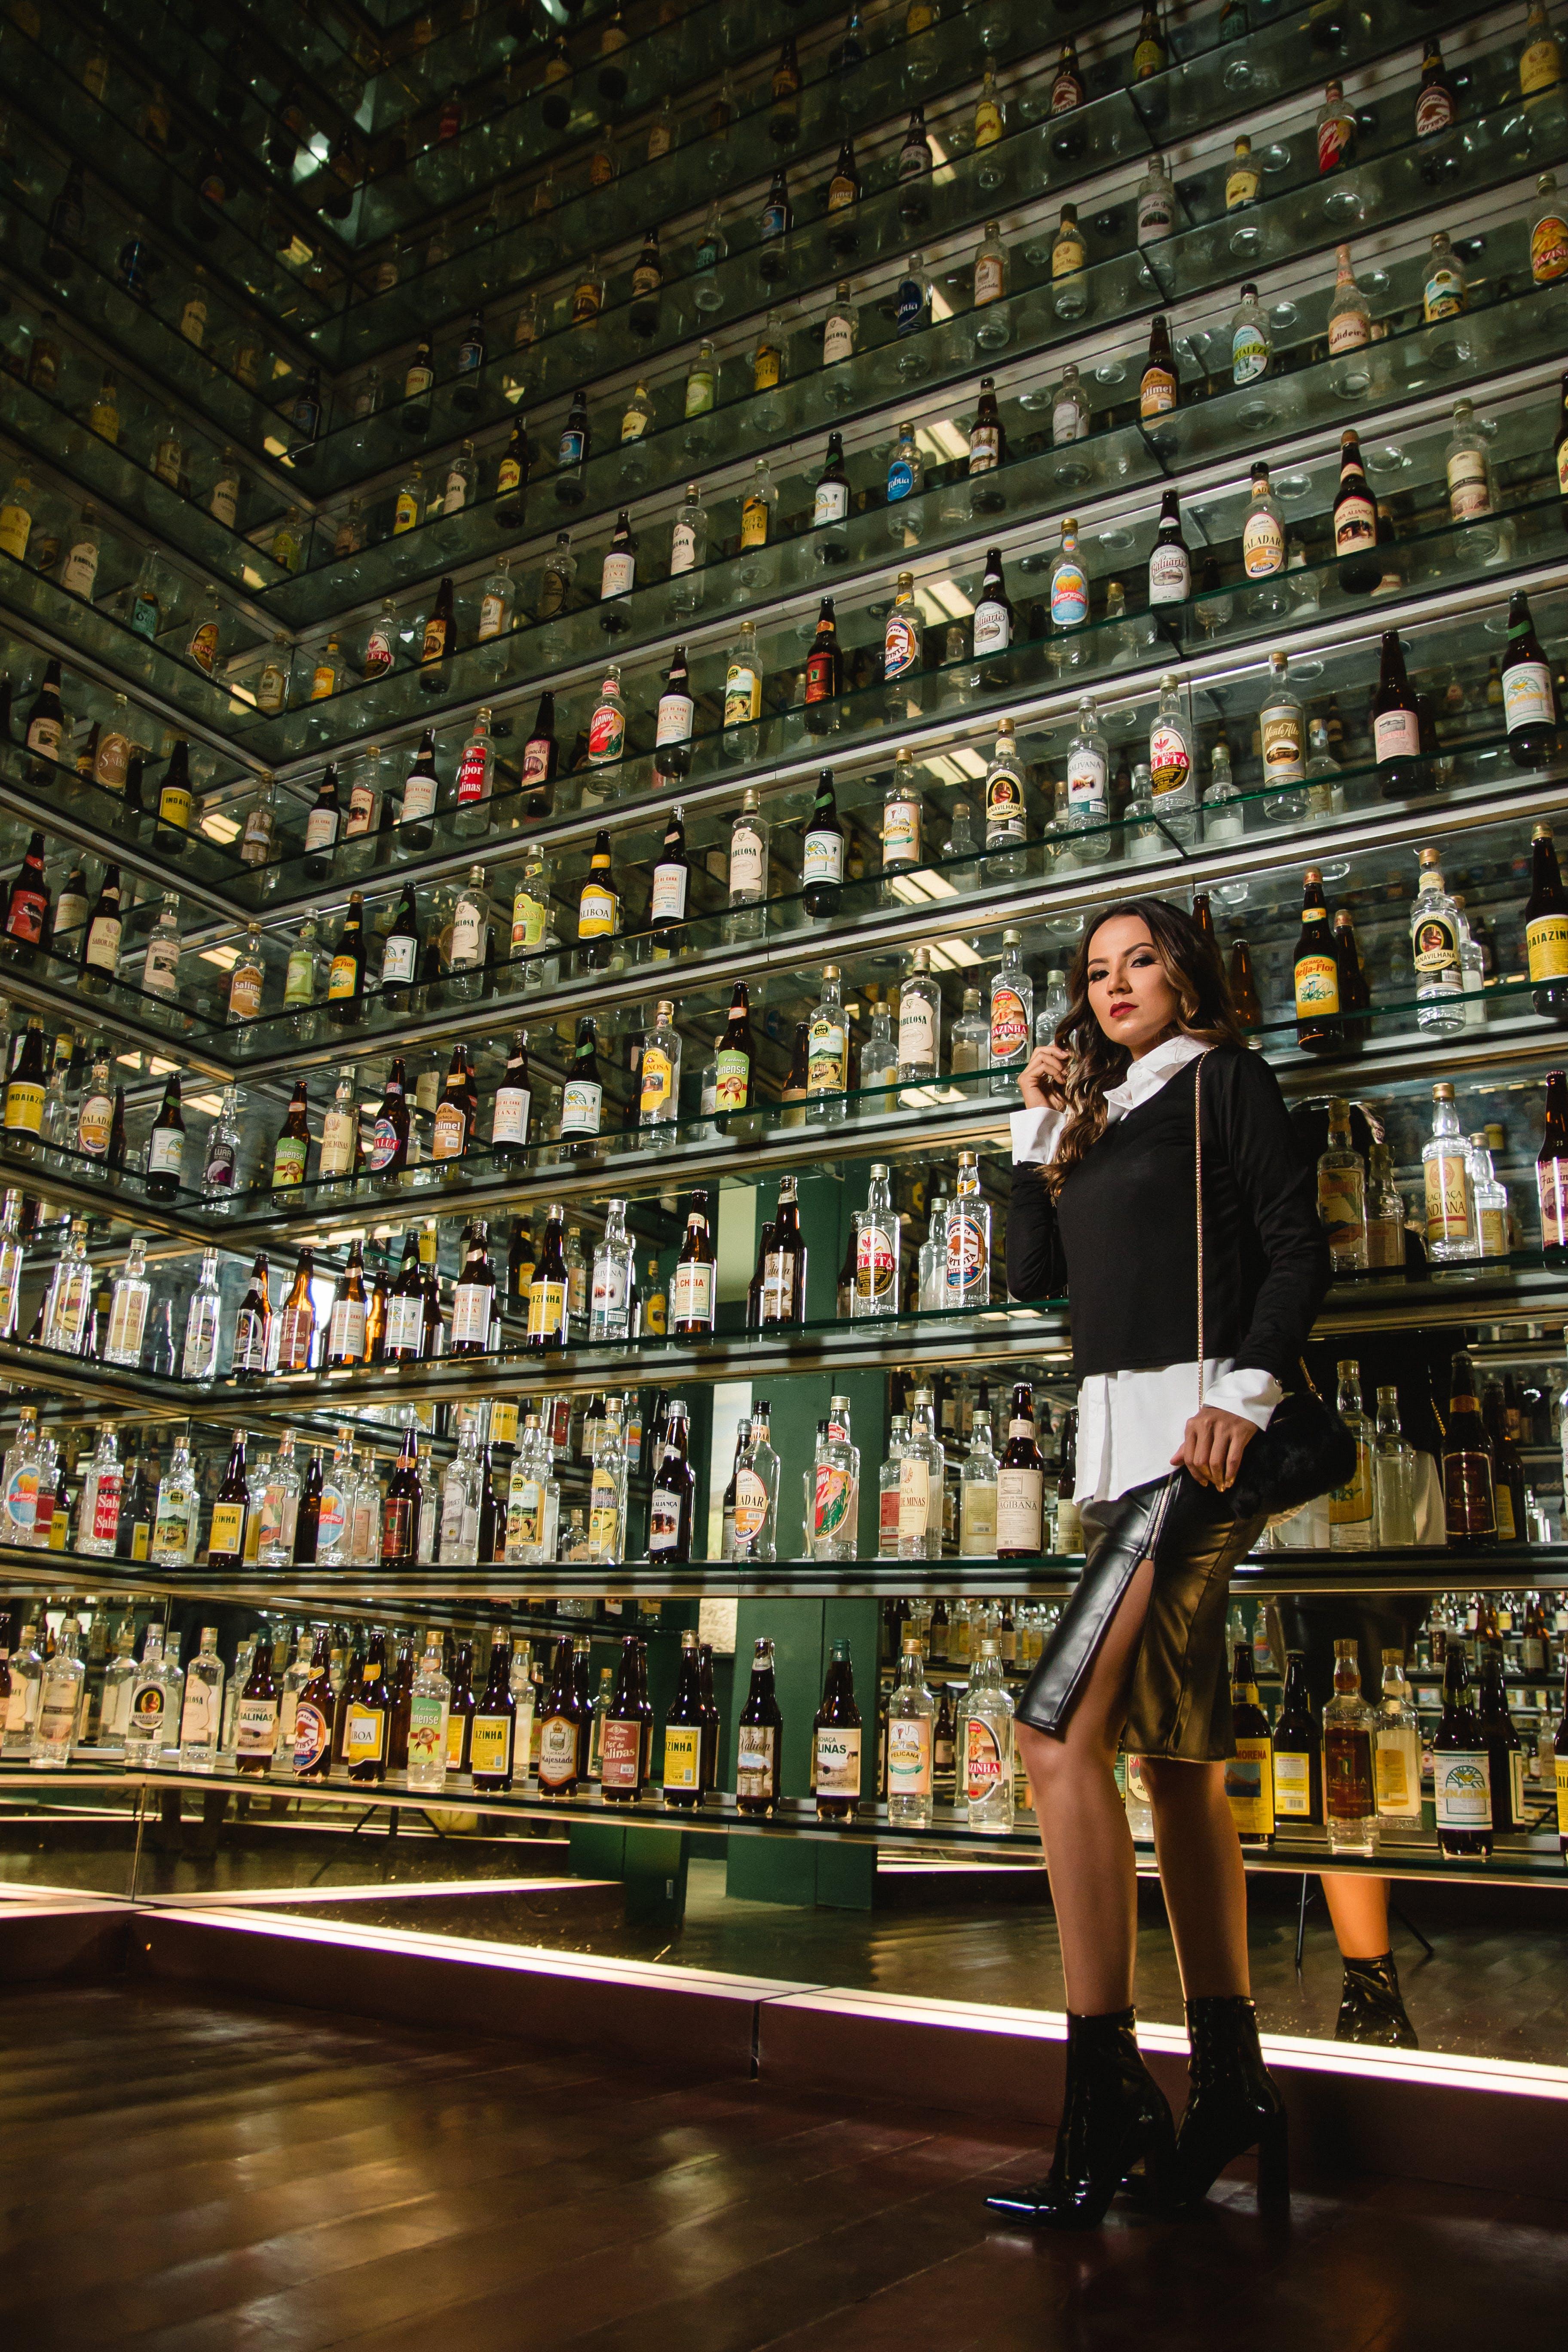 Photo of Woman Standing Near Shelves for Liquor